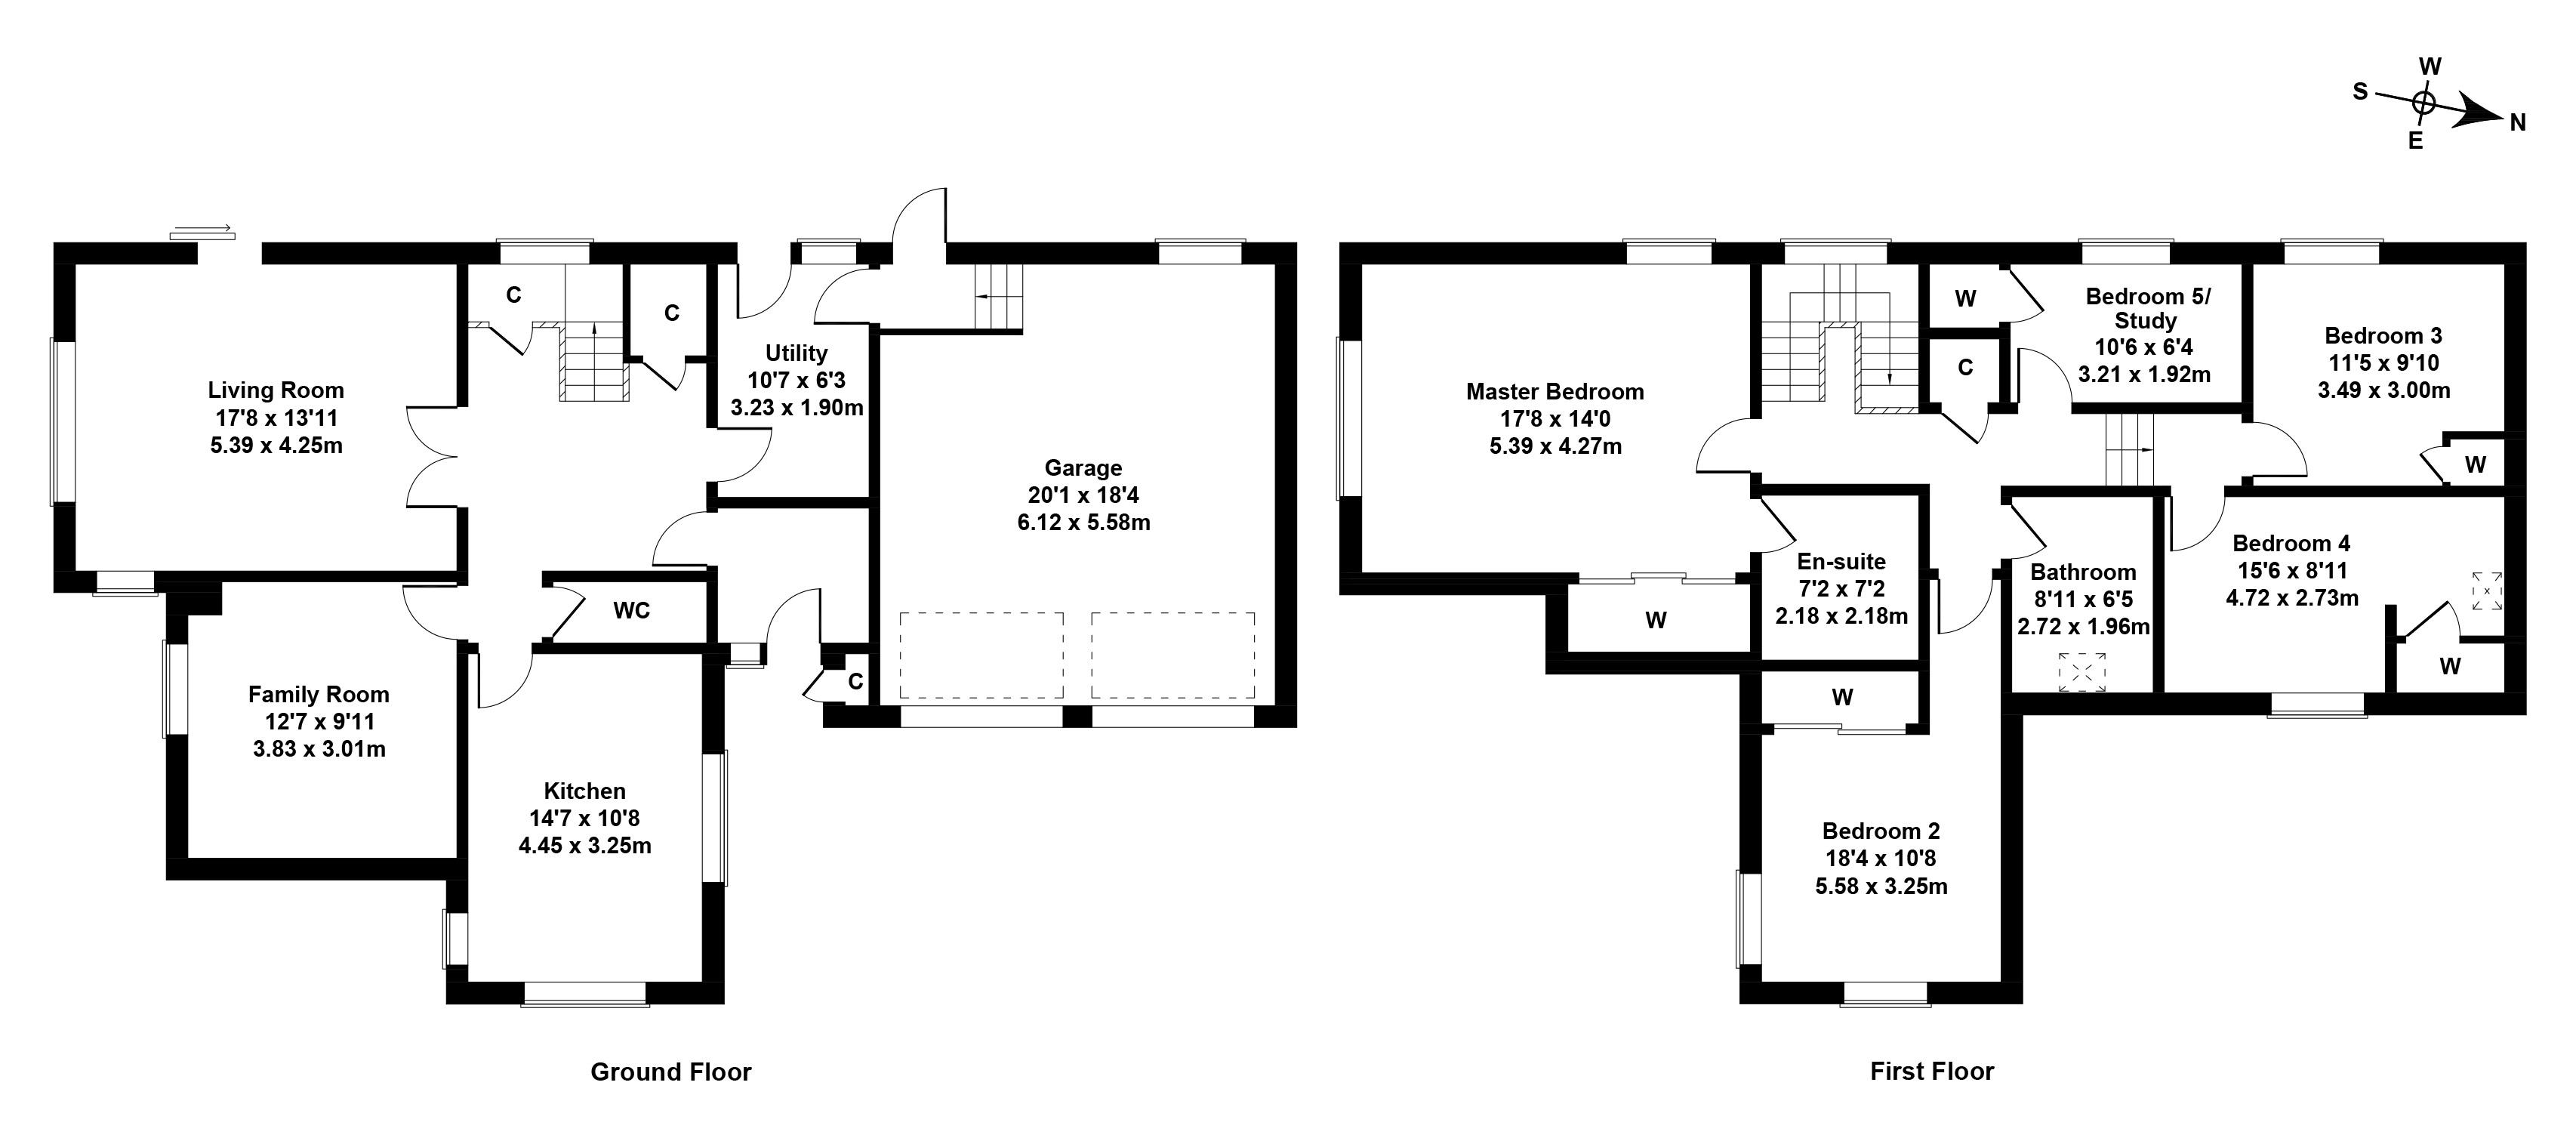 Floorplan 1 of 5 Red Fox Crescent, Penicuik, Midlothian, EH26 0RQ